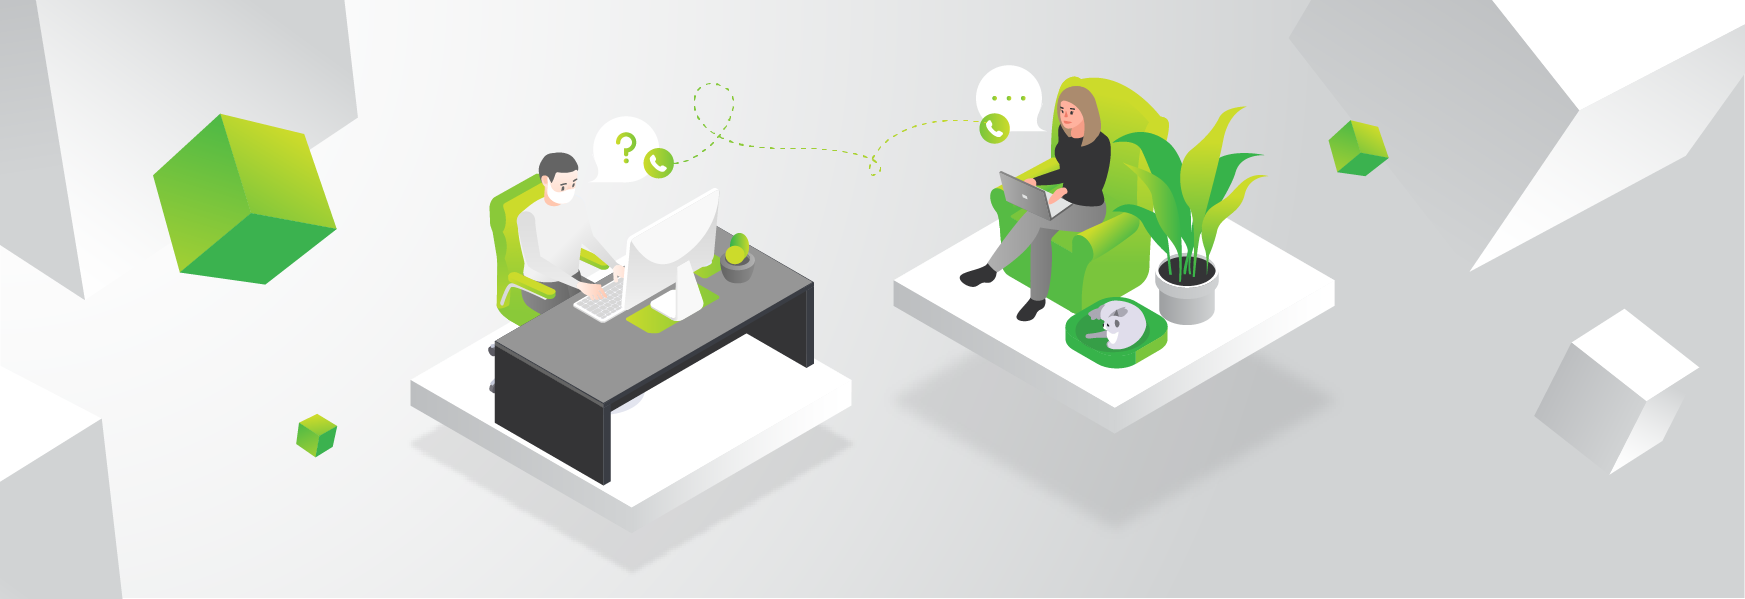 How Does Digital Transformation Work